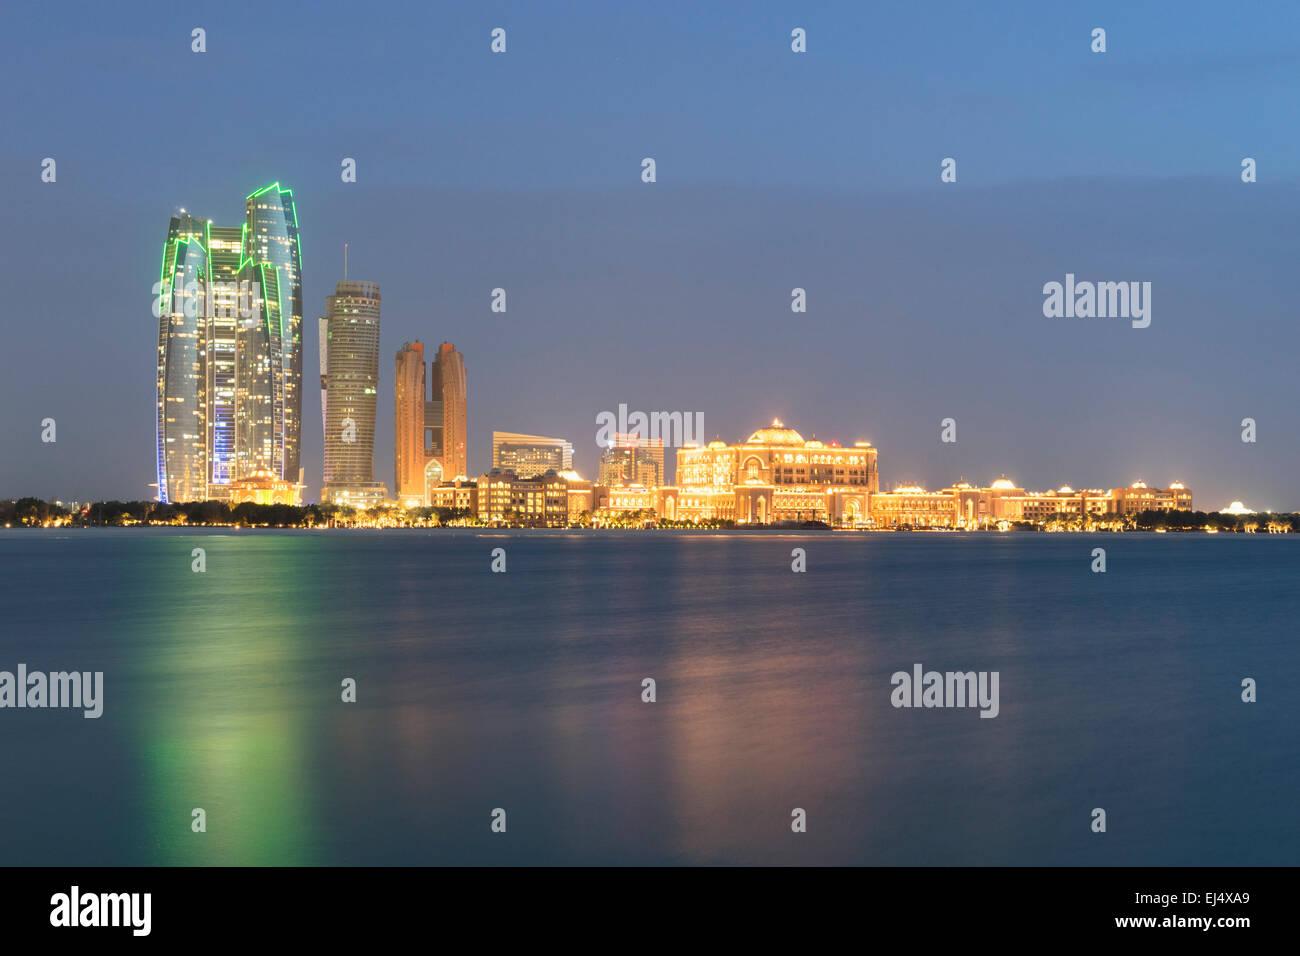 Skyline serale vista di Abu Dhabi con Emirates Palace Hotel in Emirati Arabi Uniti Immagini Stock